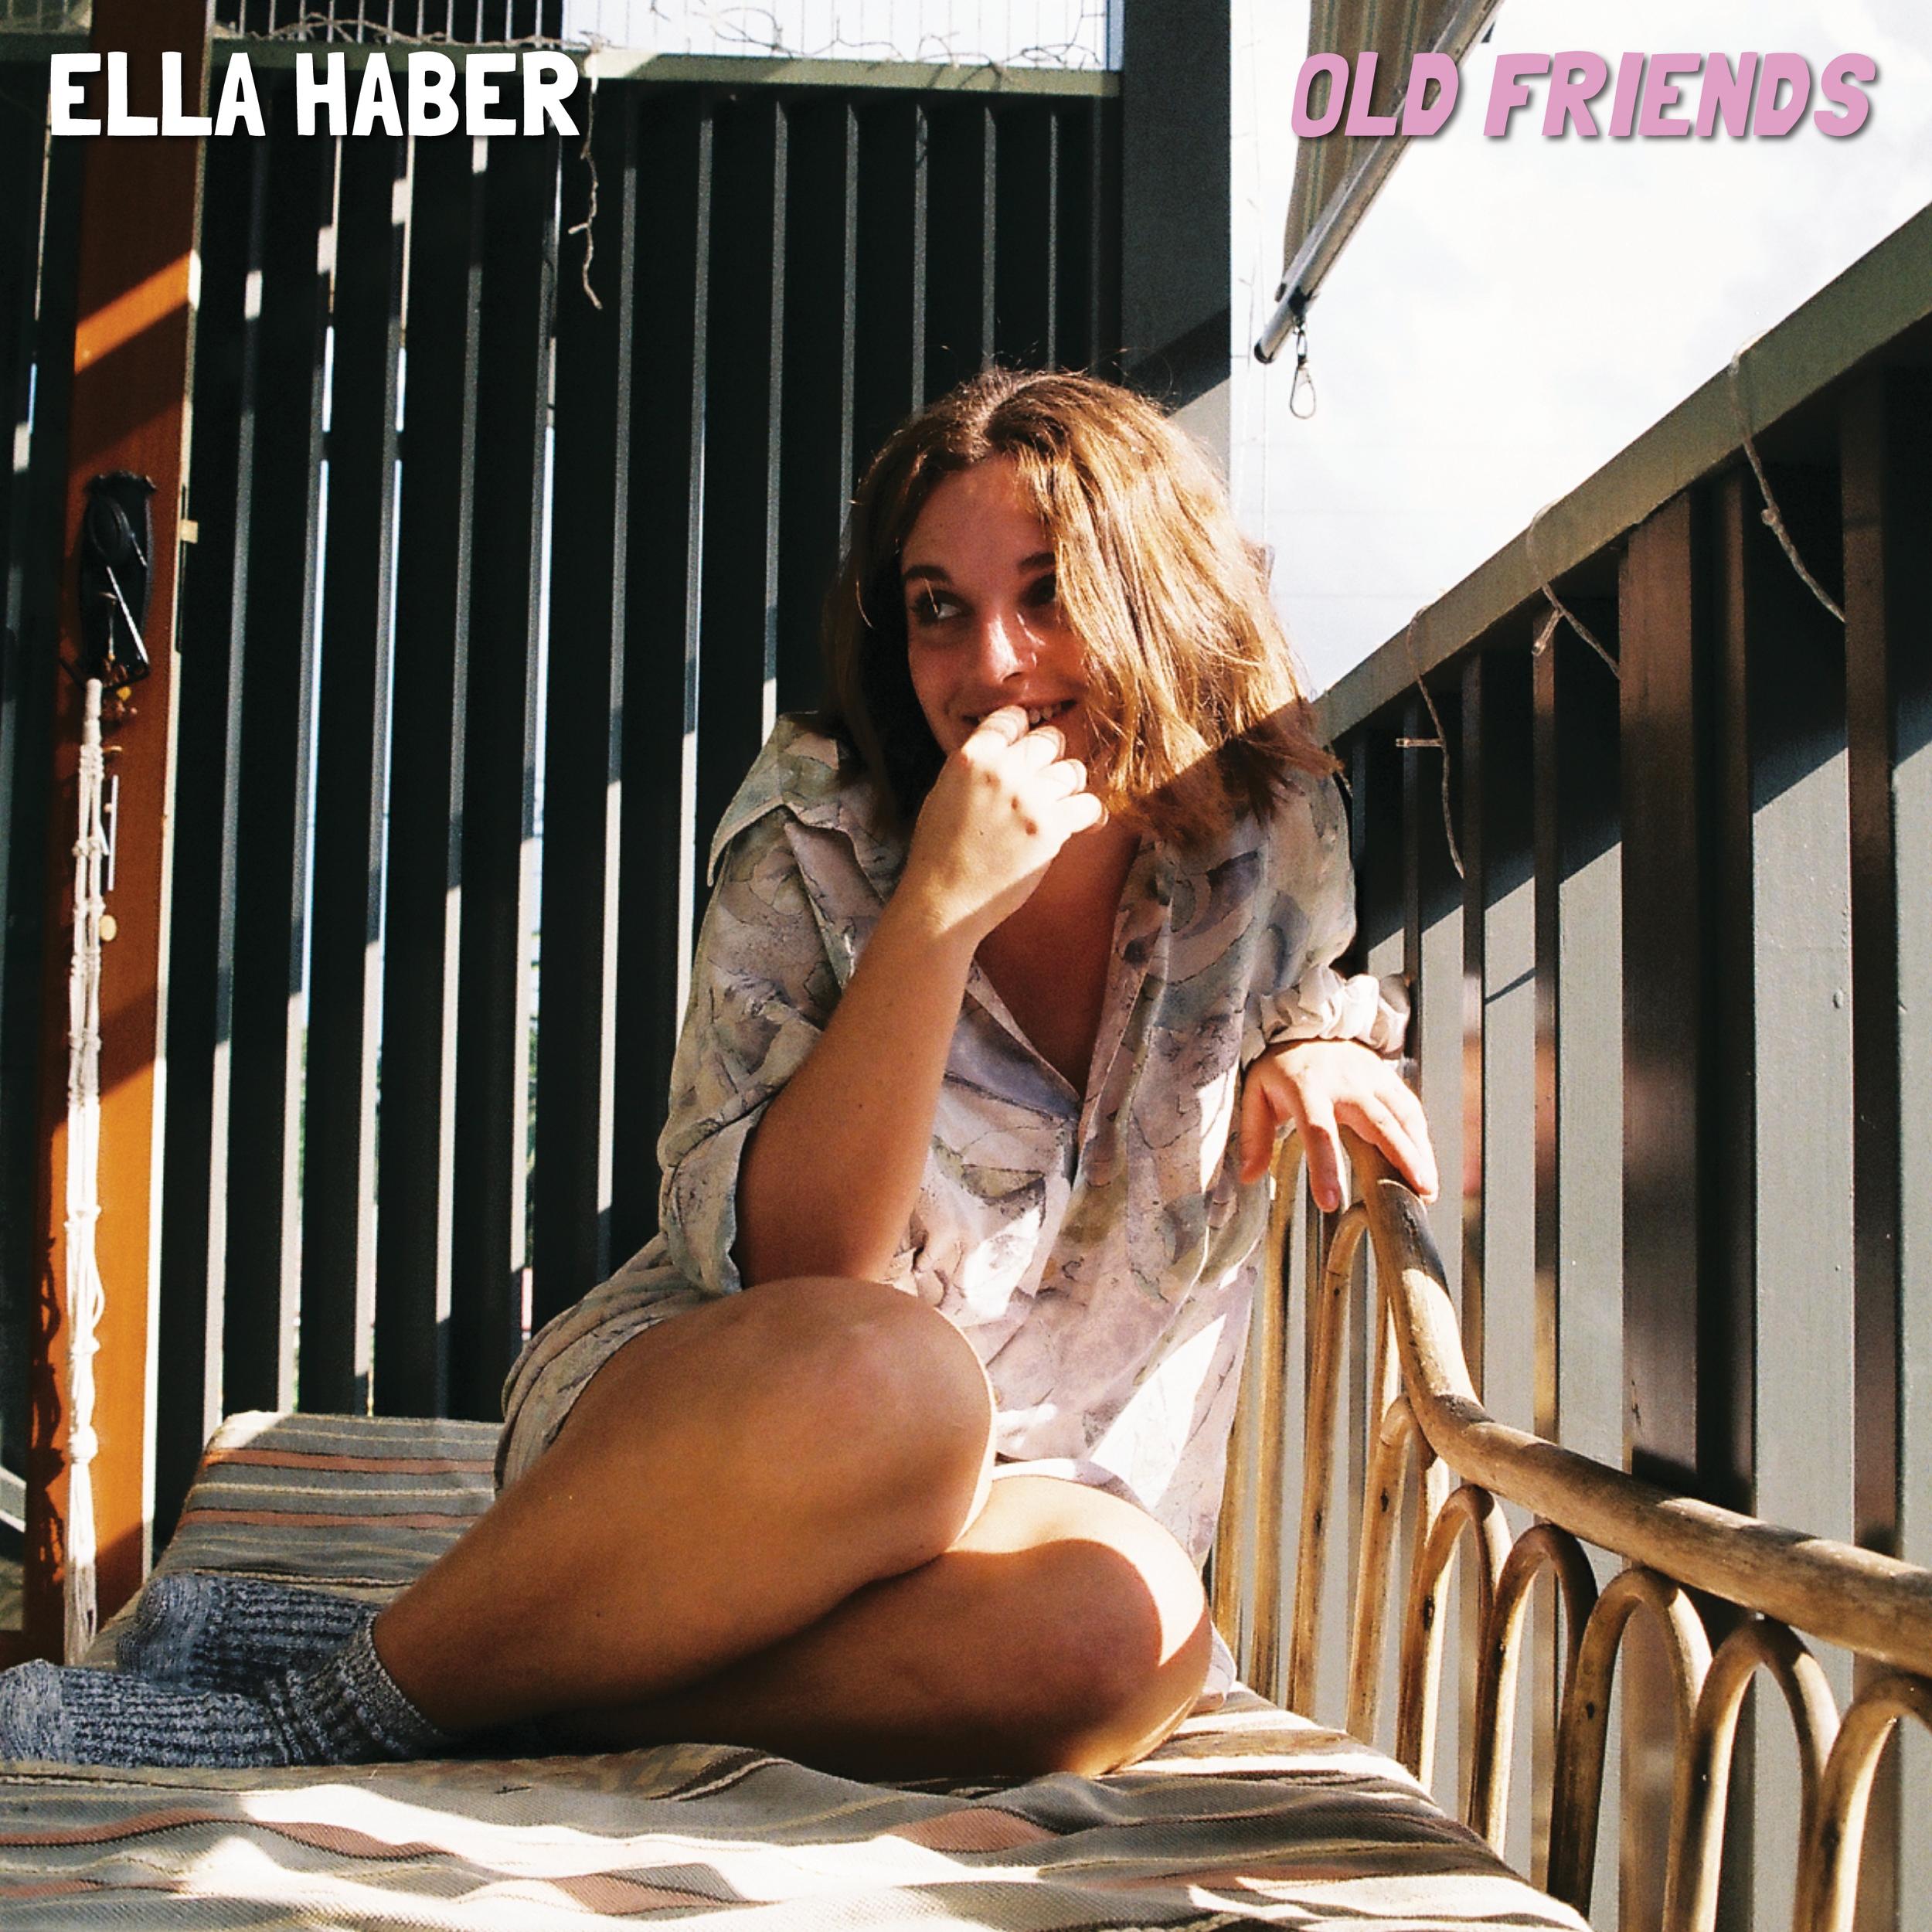 Ella_Haber_Old_Friends_Cover.png